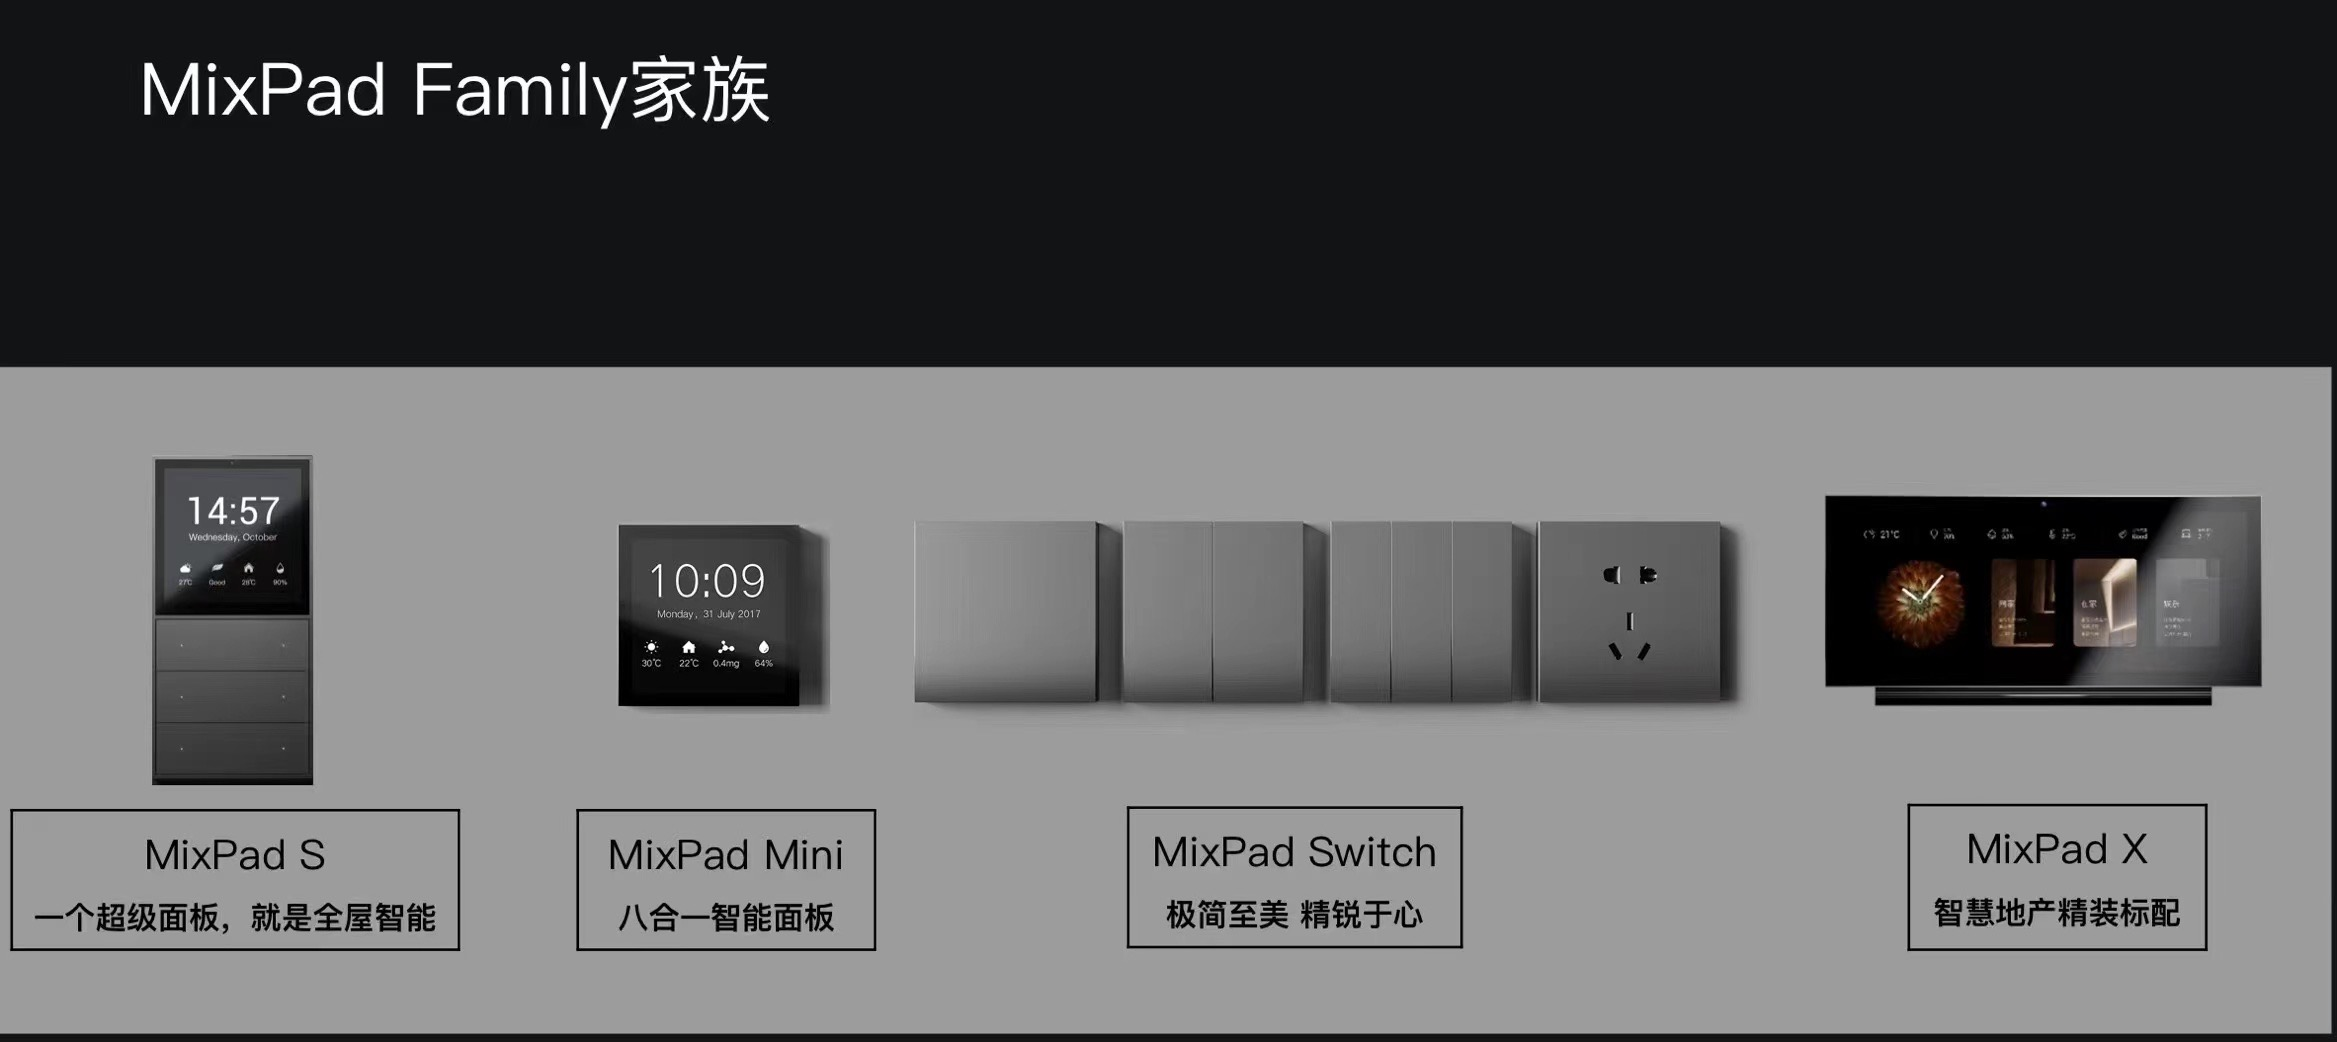 MixPad Family家族一家之主MixPadX高調亮相全宅5G智慧生活由此開啓